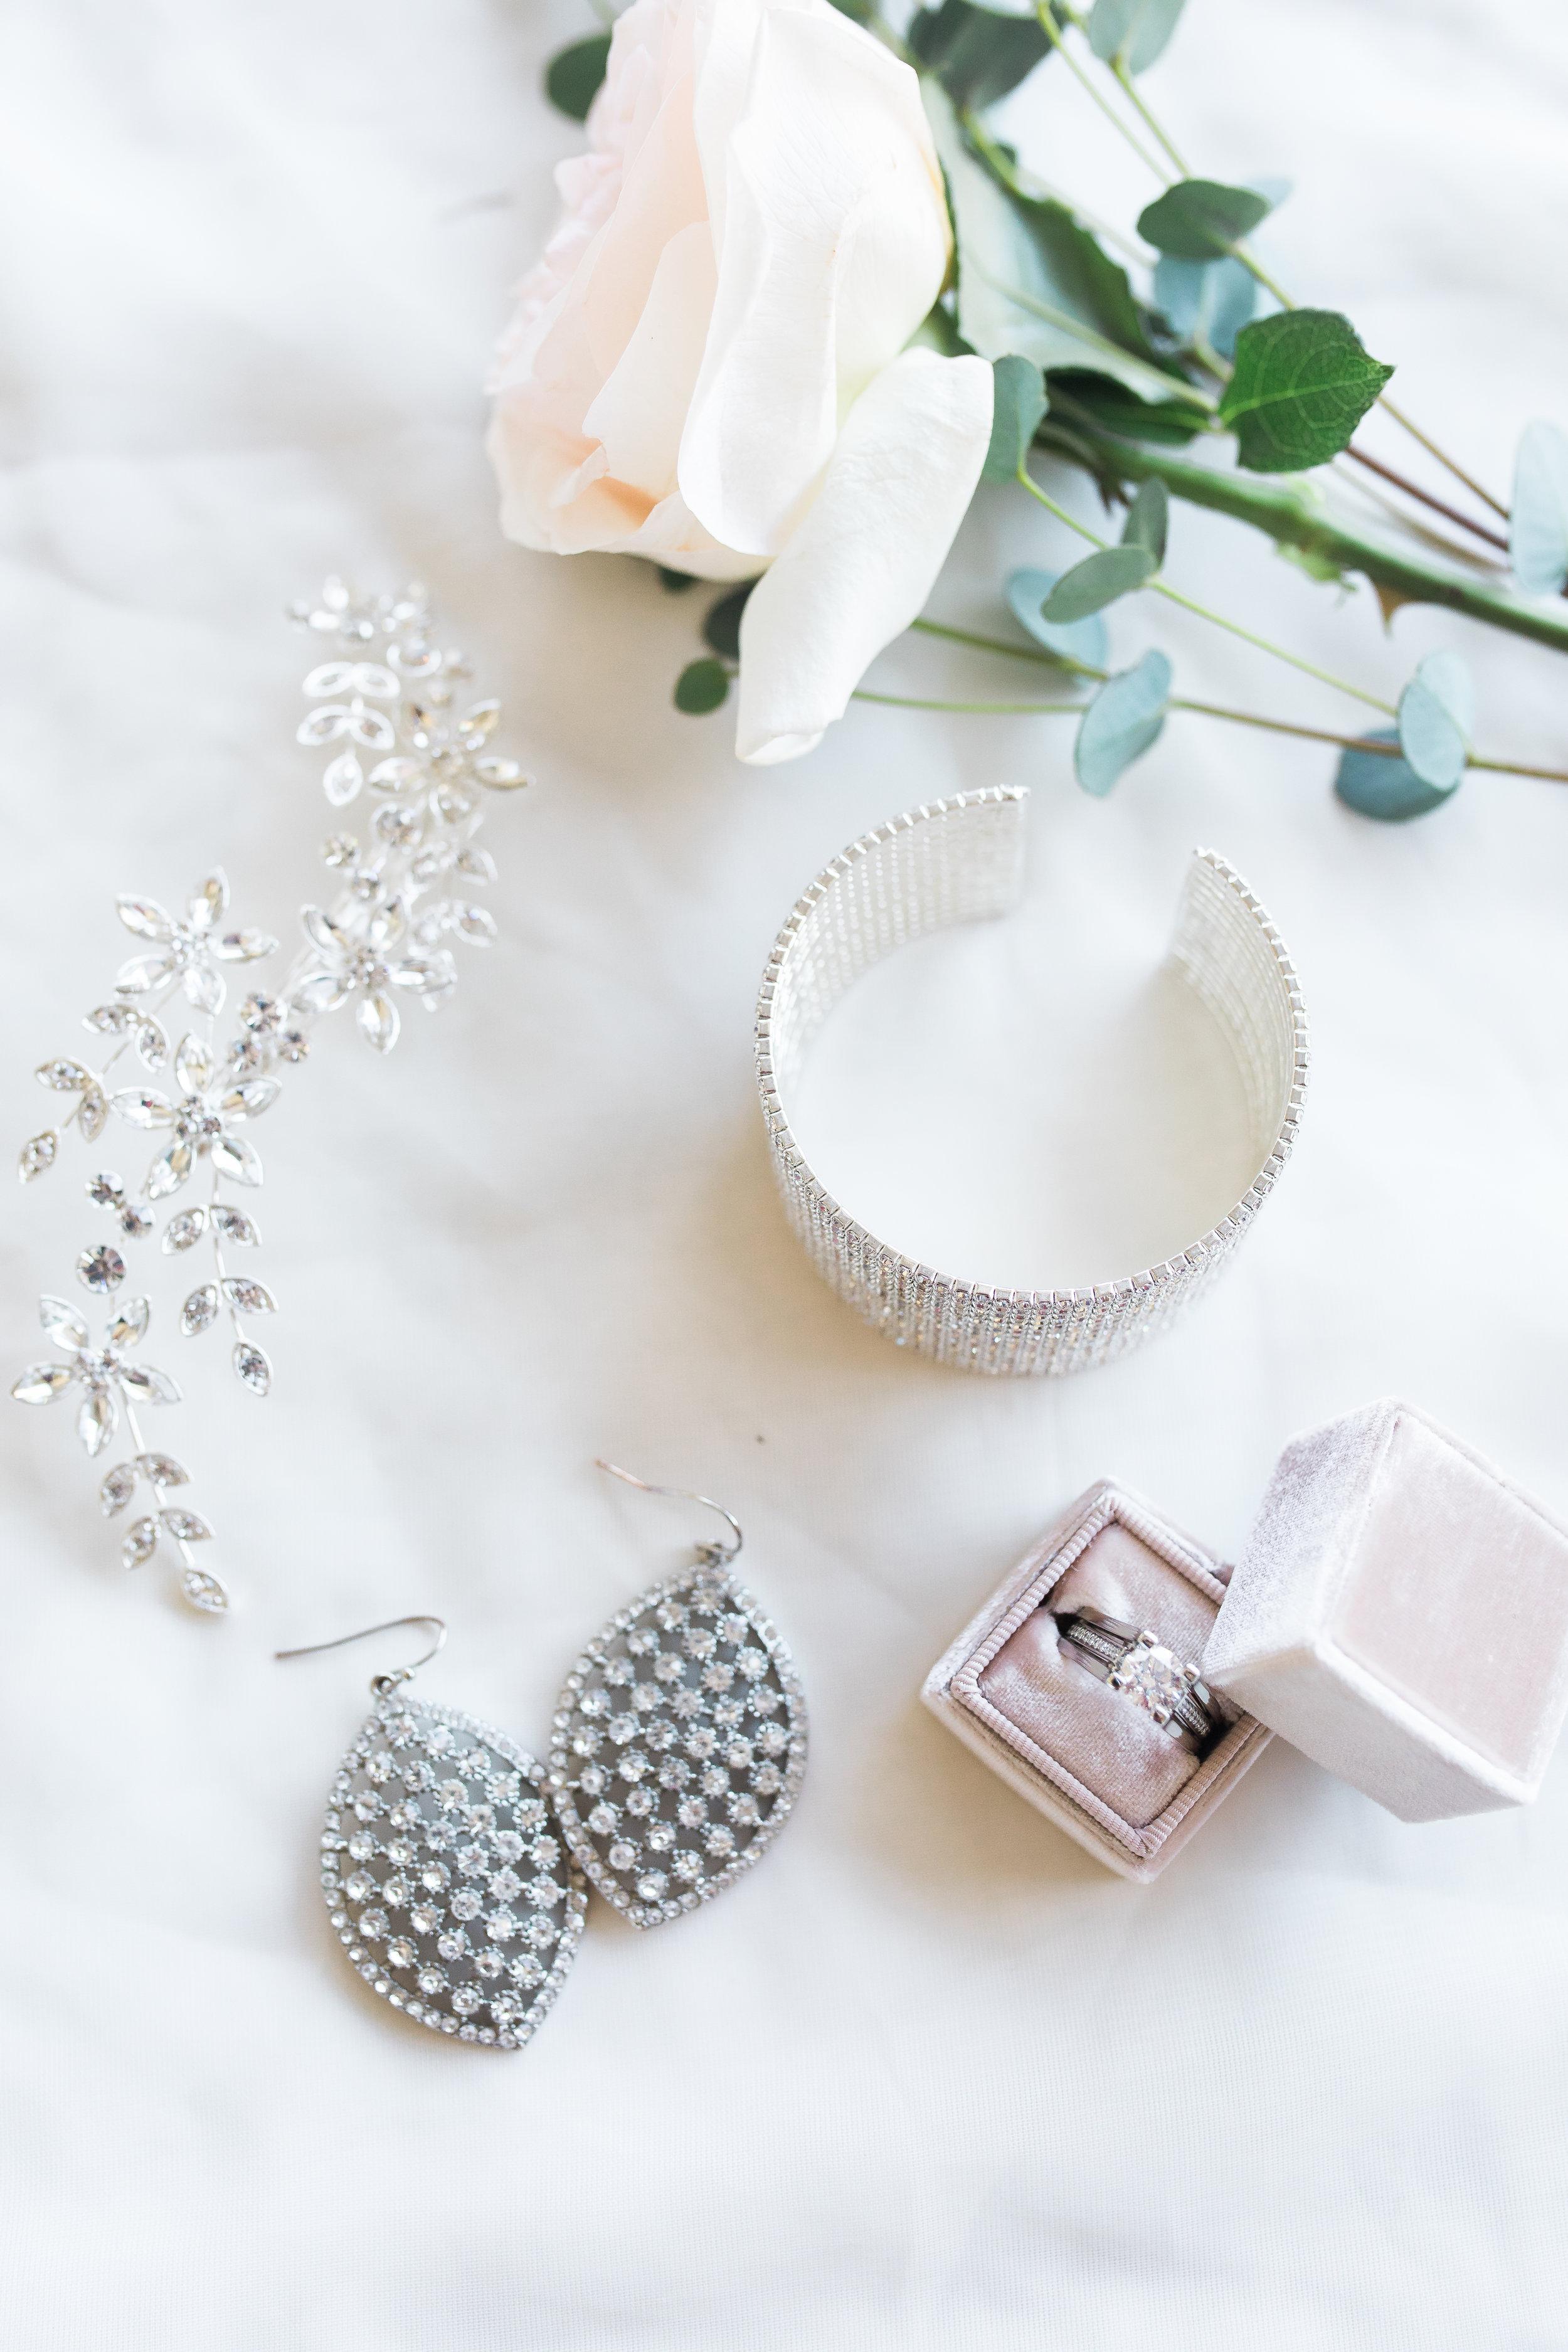 Gather-Estate-Wedding-Mesa-Arizona-Tara-Nichole-Photo-3.jpg